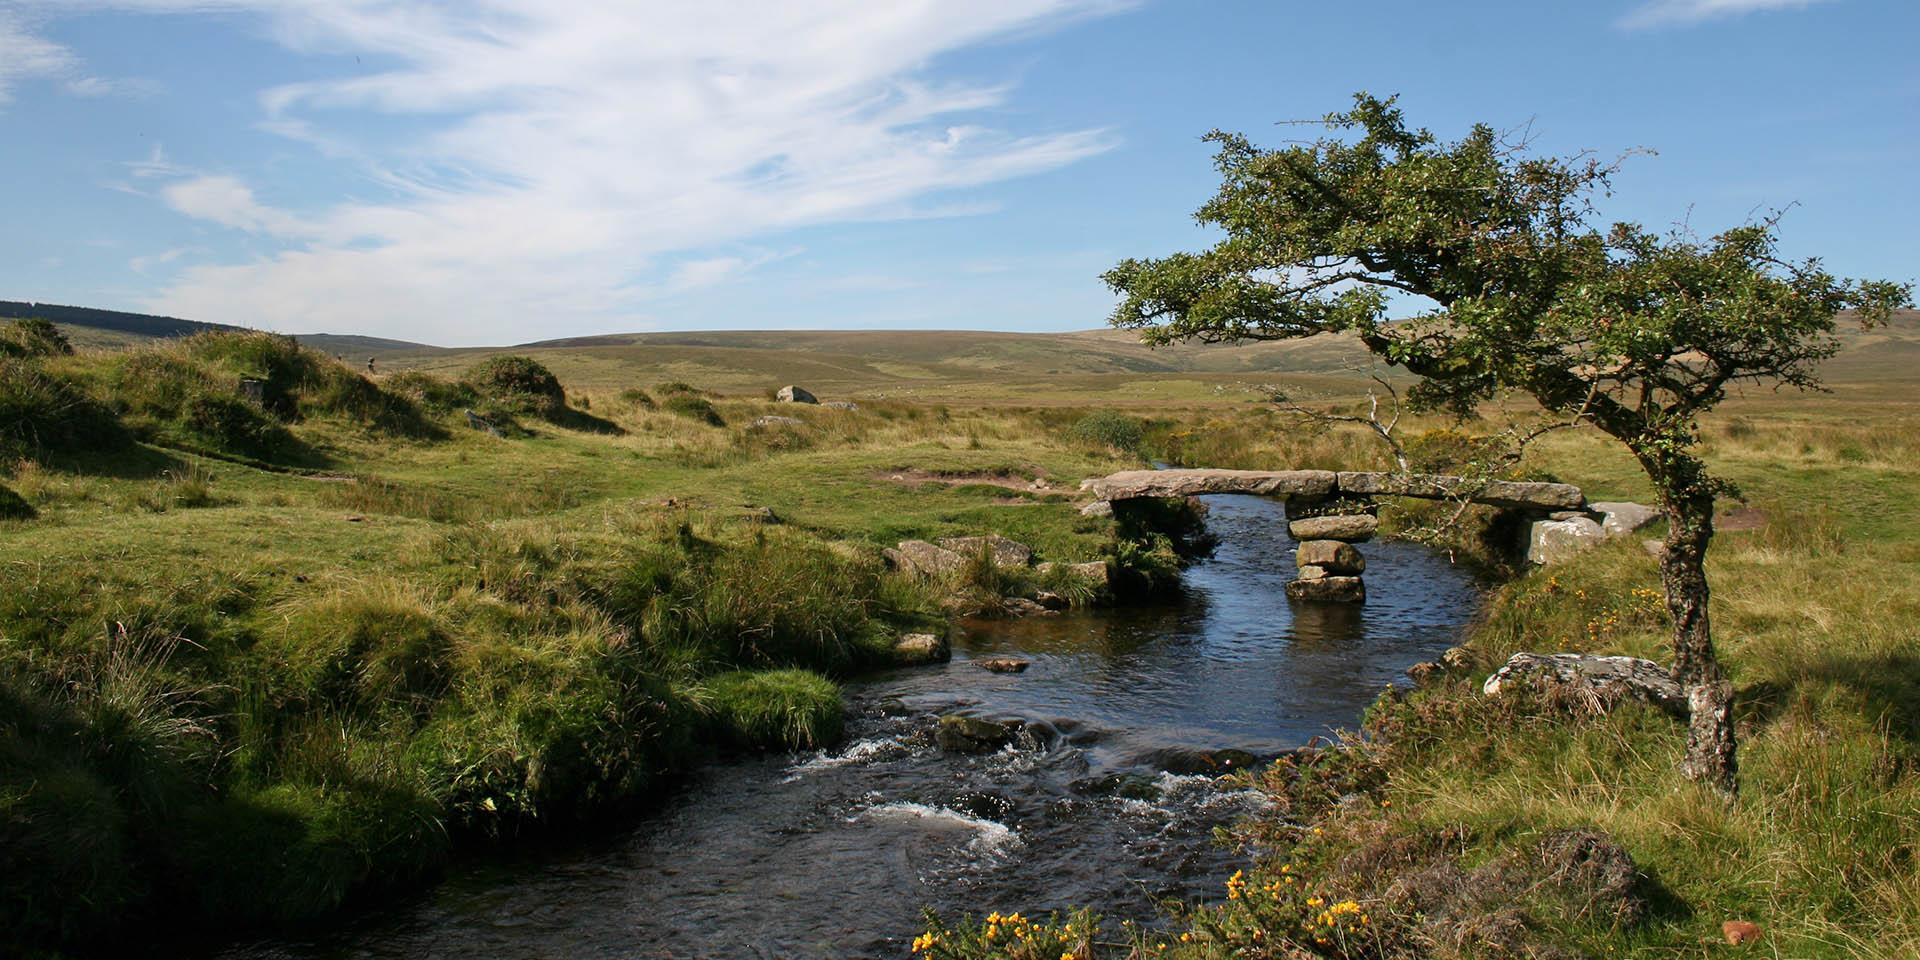 River Teign and clapper bridge on moor